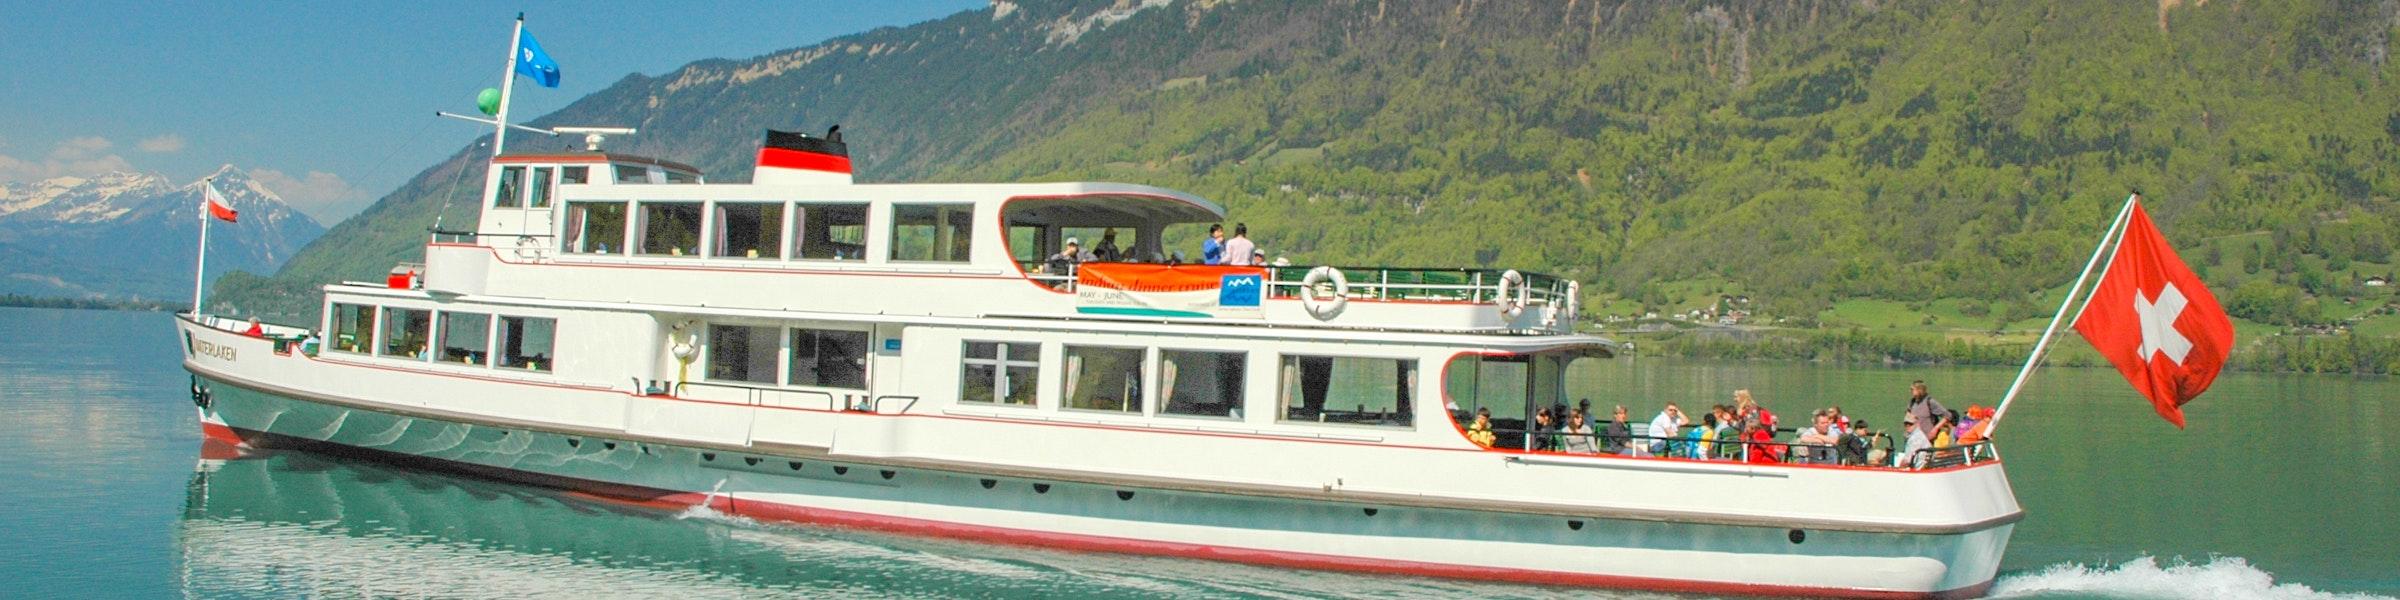 Lake Brienz boat